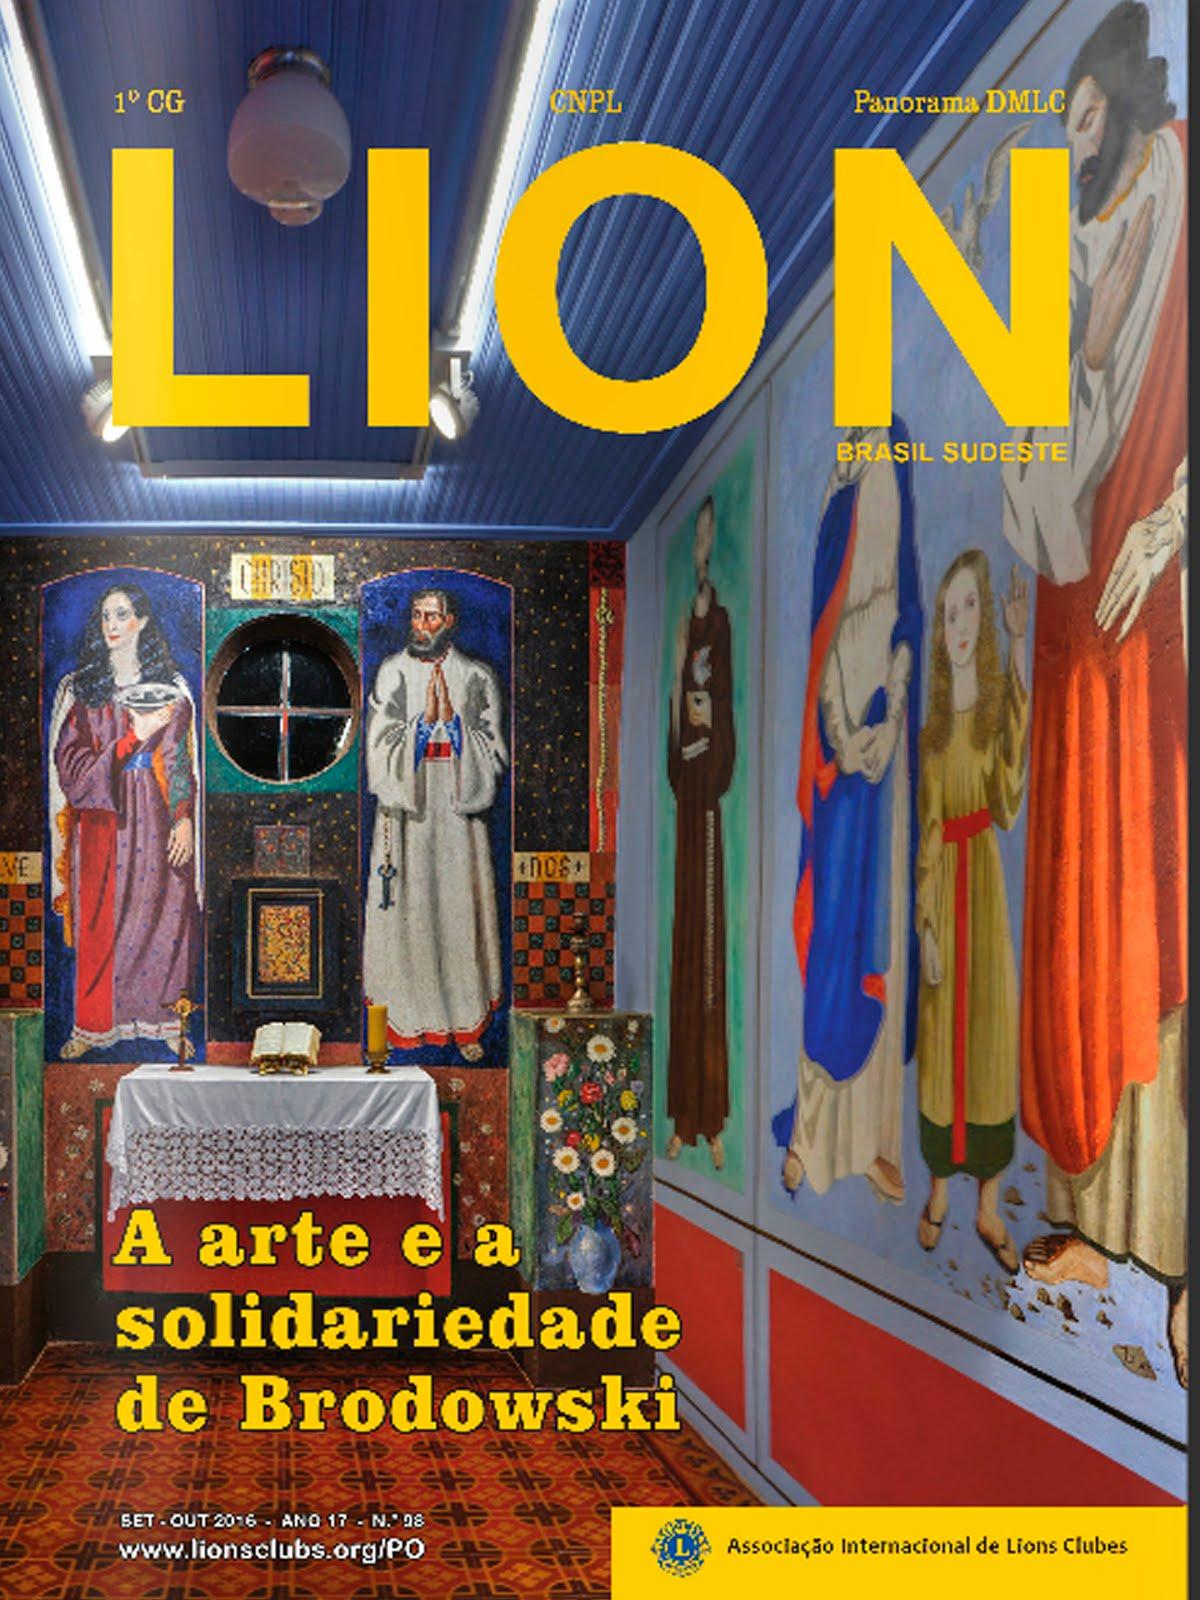 THE LION SUDESTE